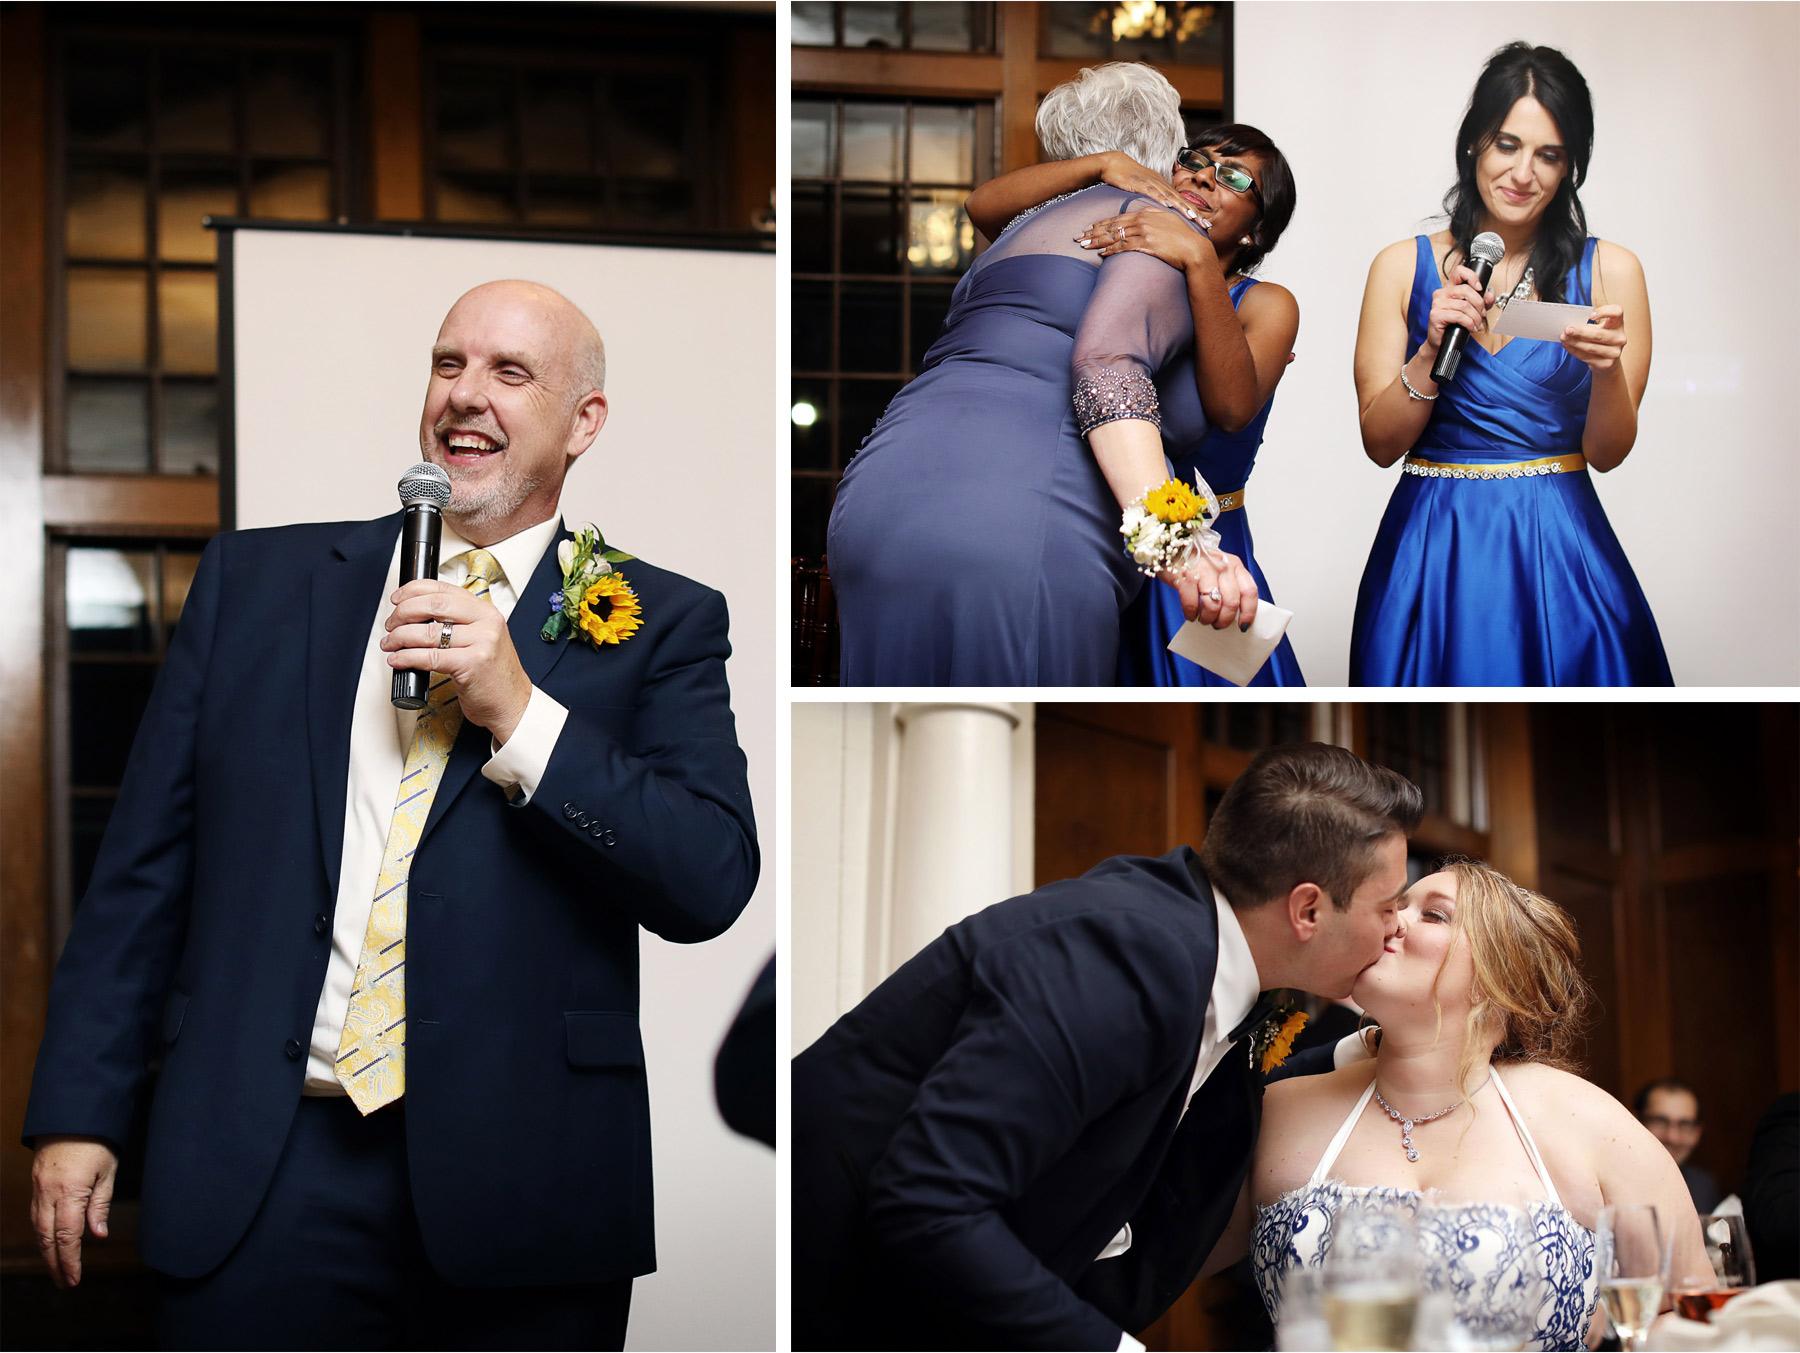 16-Saint-Paul-Minnesota-Wedding-Photography-by-Vick-Photography-The-University-Club-Reception-Toasts-Mari-and-Giuseppe.jpg